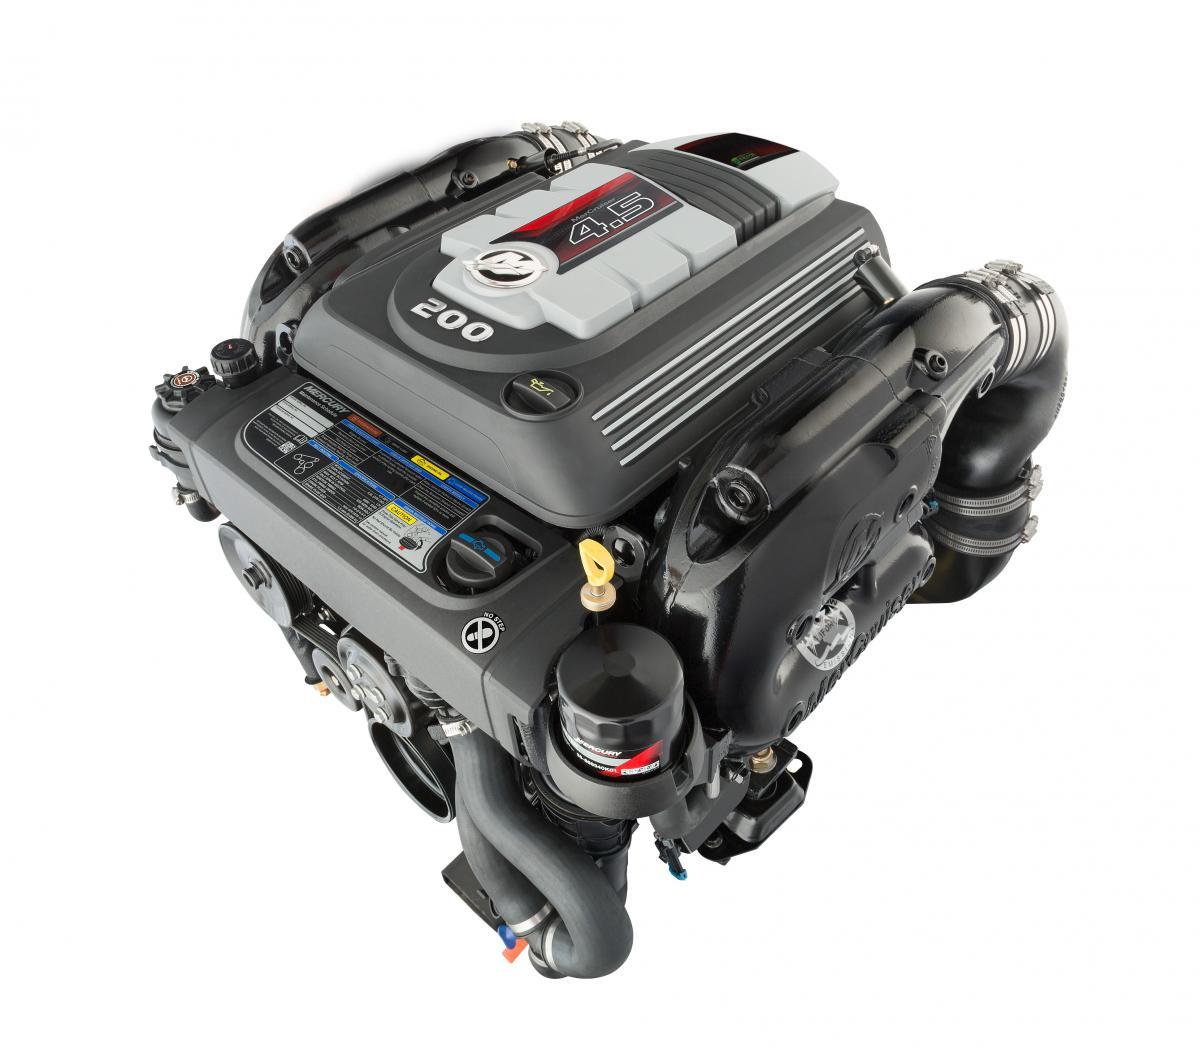 Mercruiser Sterndrive 4.5L MPI 200 HP